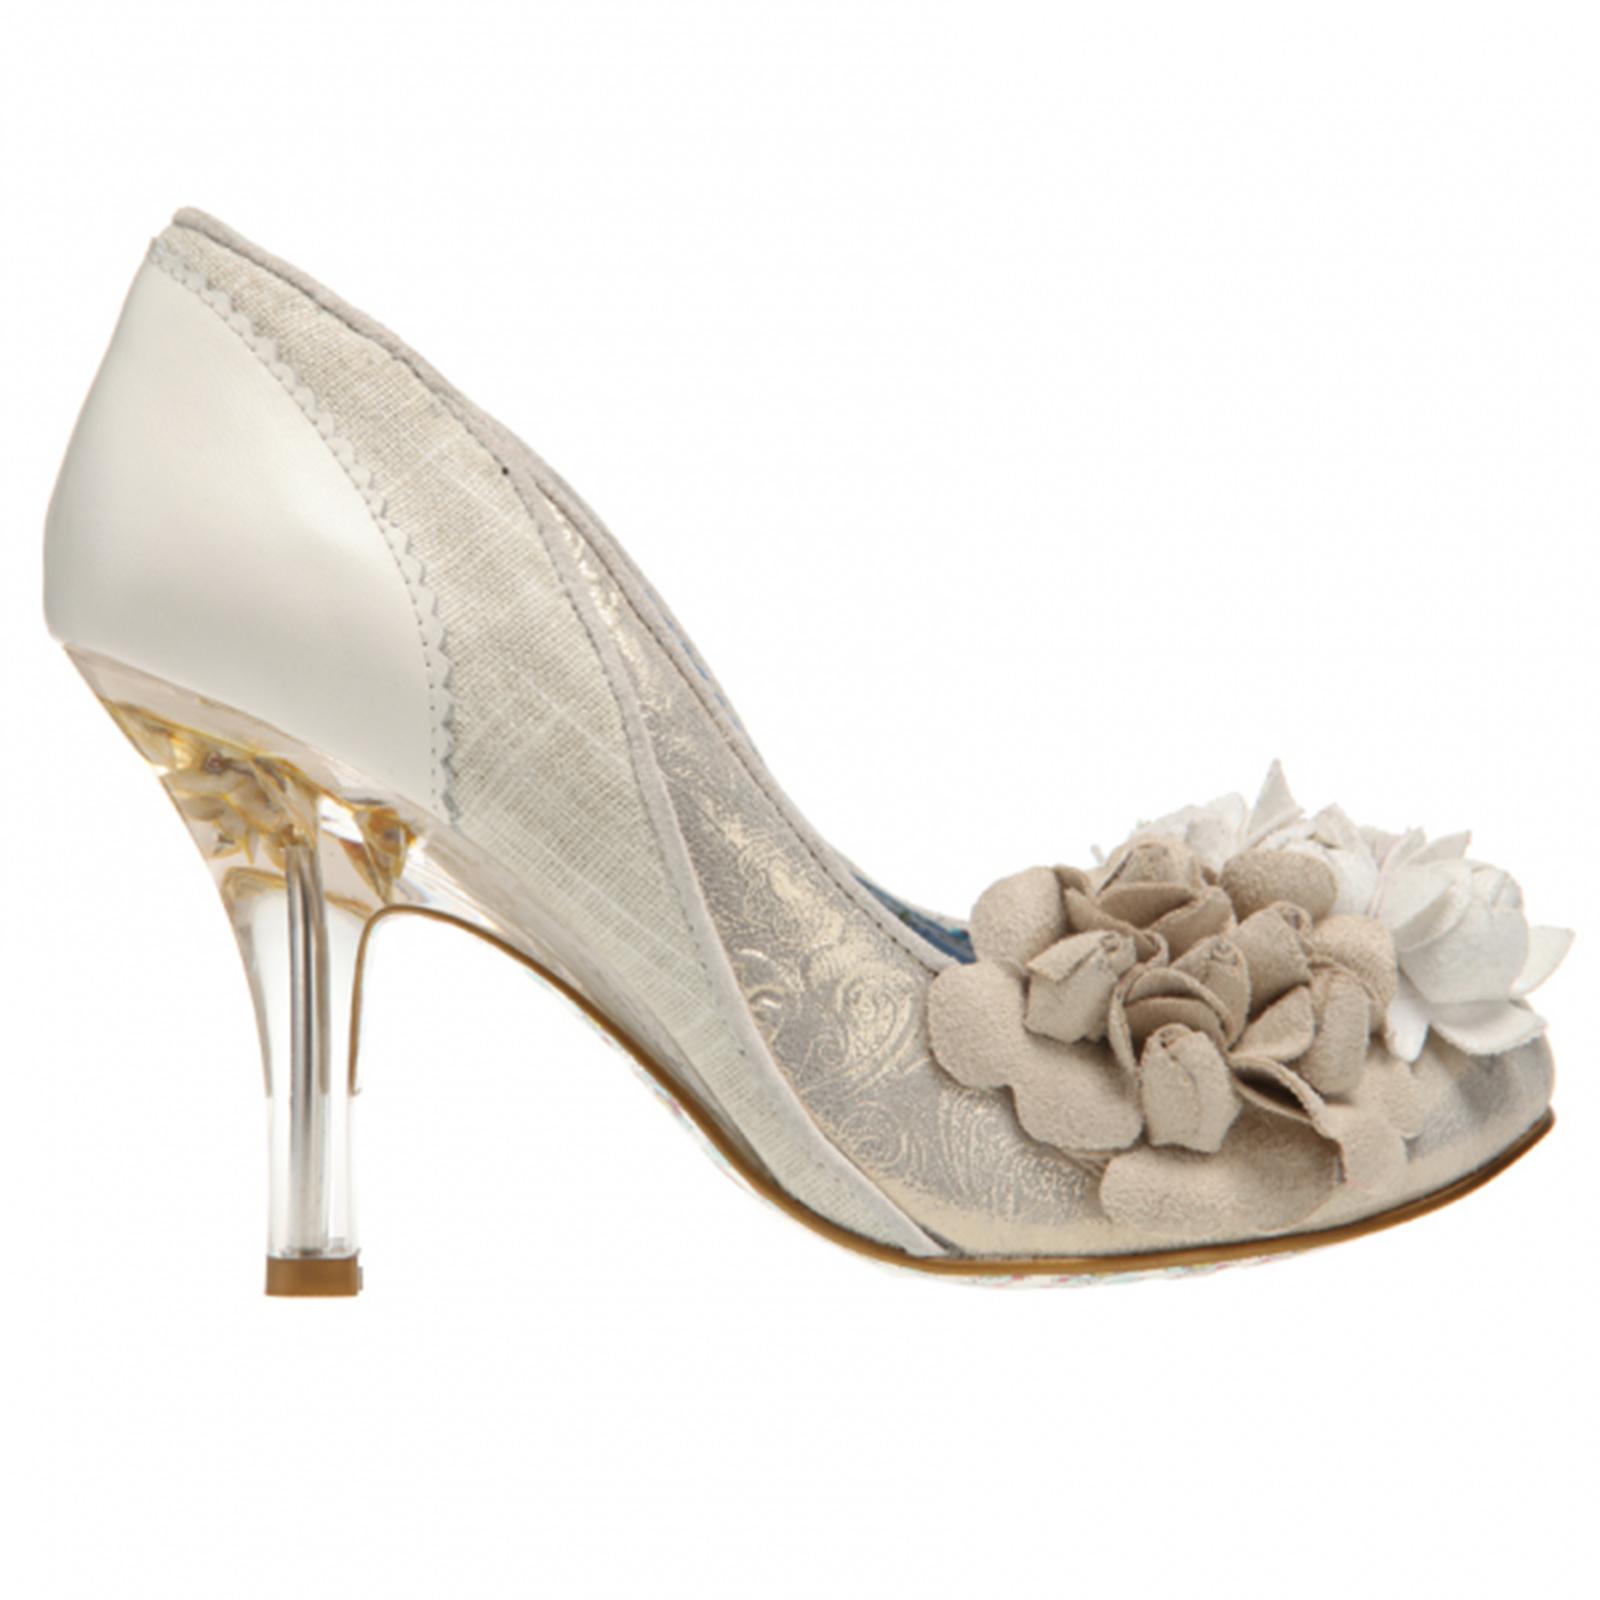 Irregular Choice Mrs Lower Ivory Gold Vintage Style High Heel Wedding Shoes